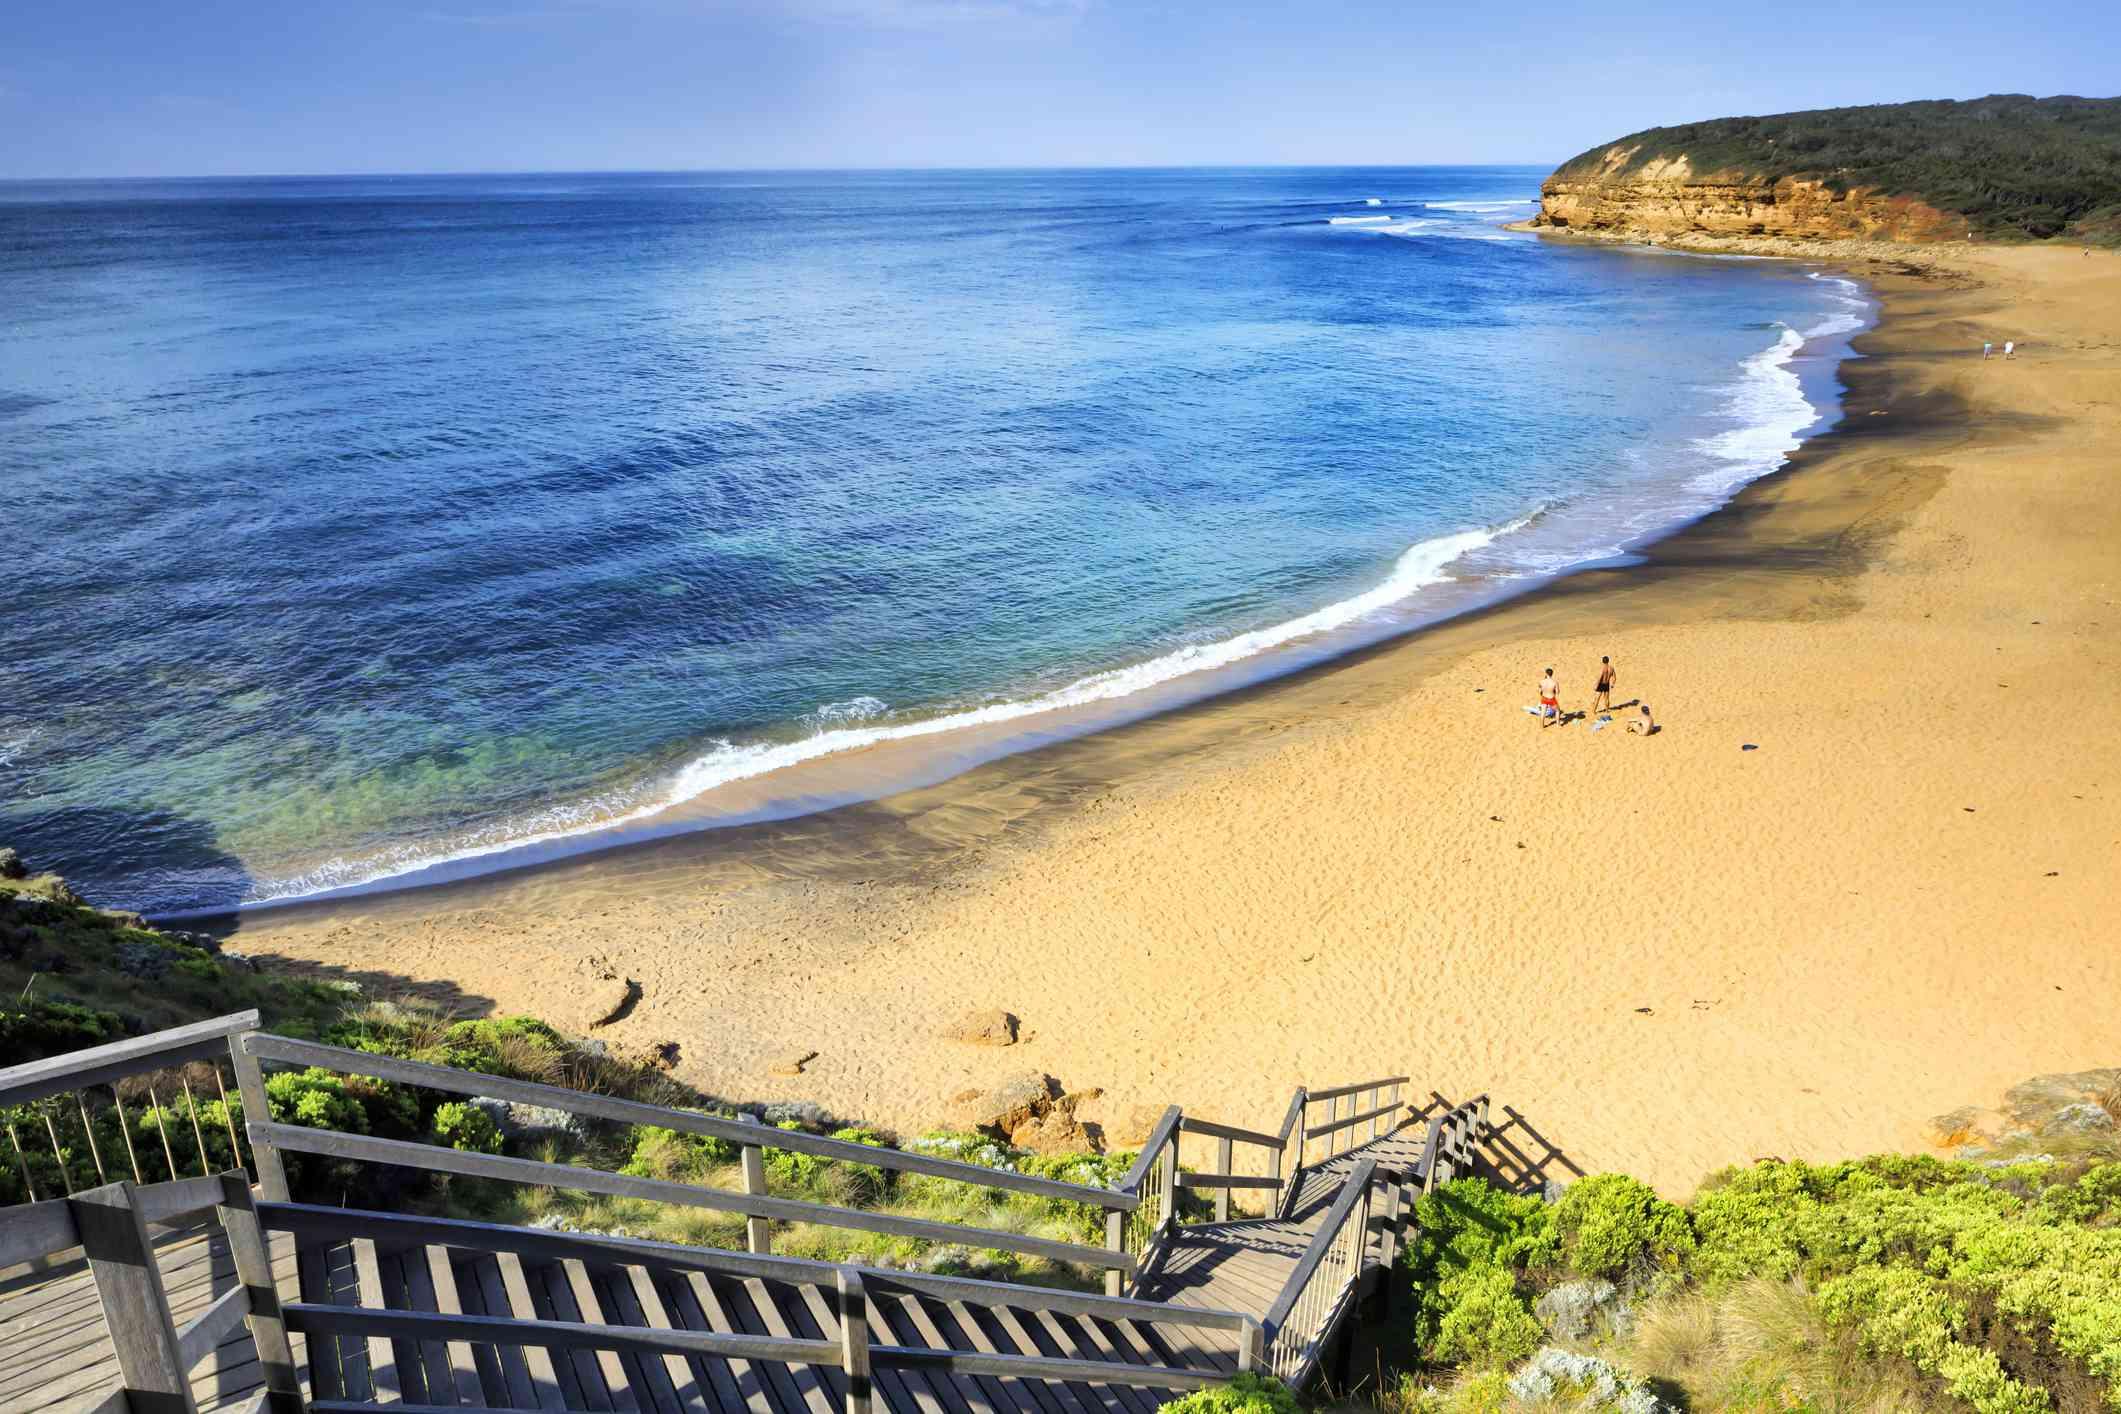 Enjoyment at Bells Beach near Torquay, Victoria, Australia, South Pacific